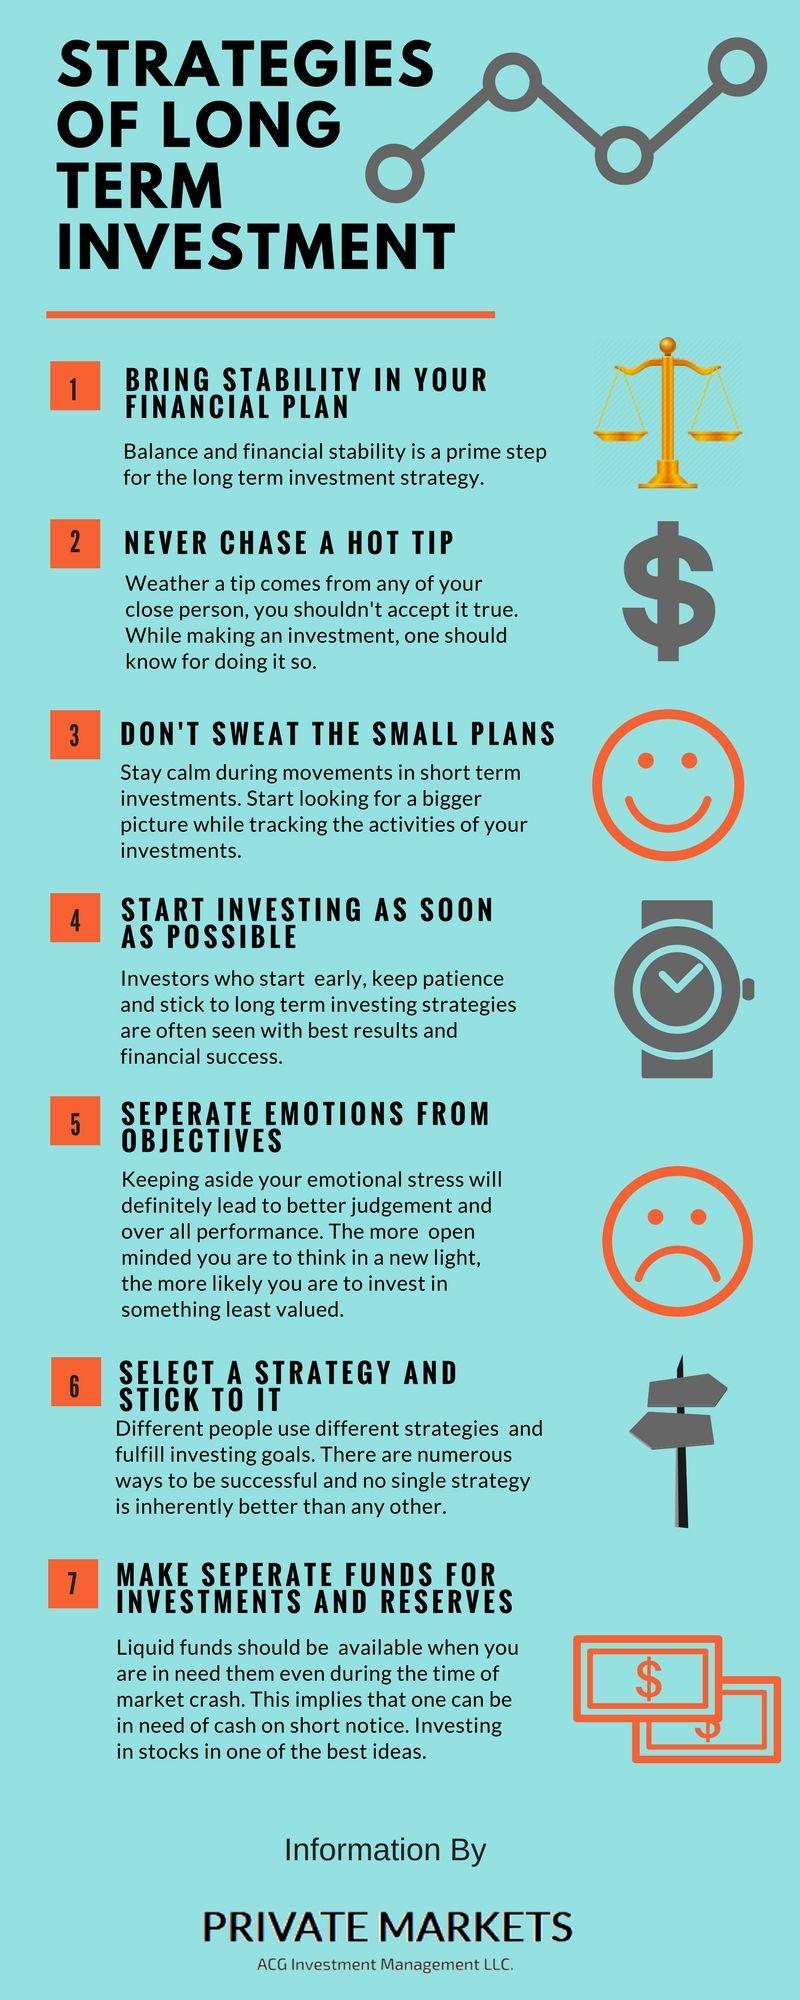 Amazon.com: Bear Market Trading Strategies eBook: Kratter ...